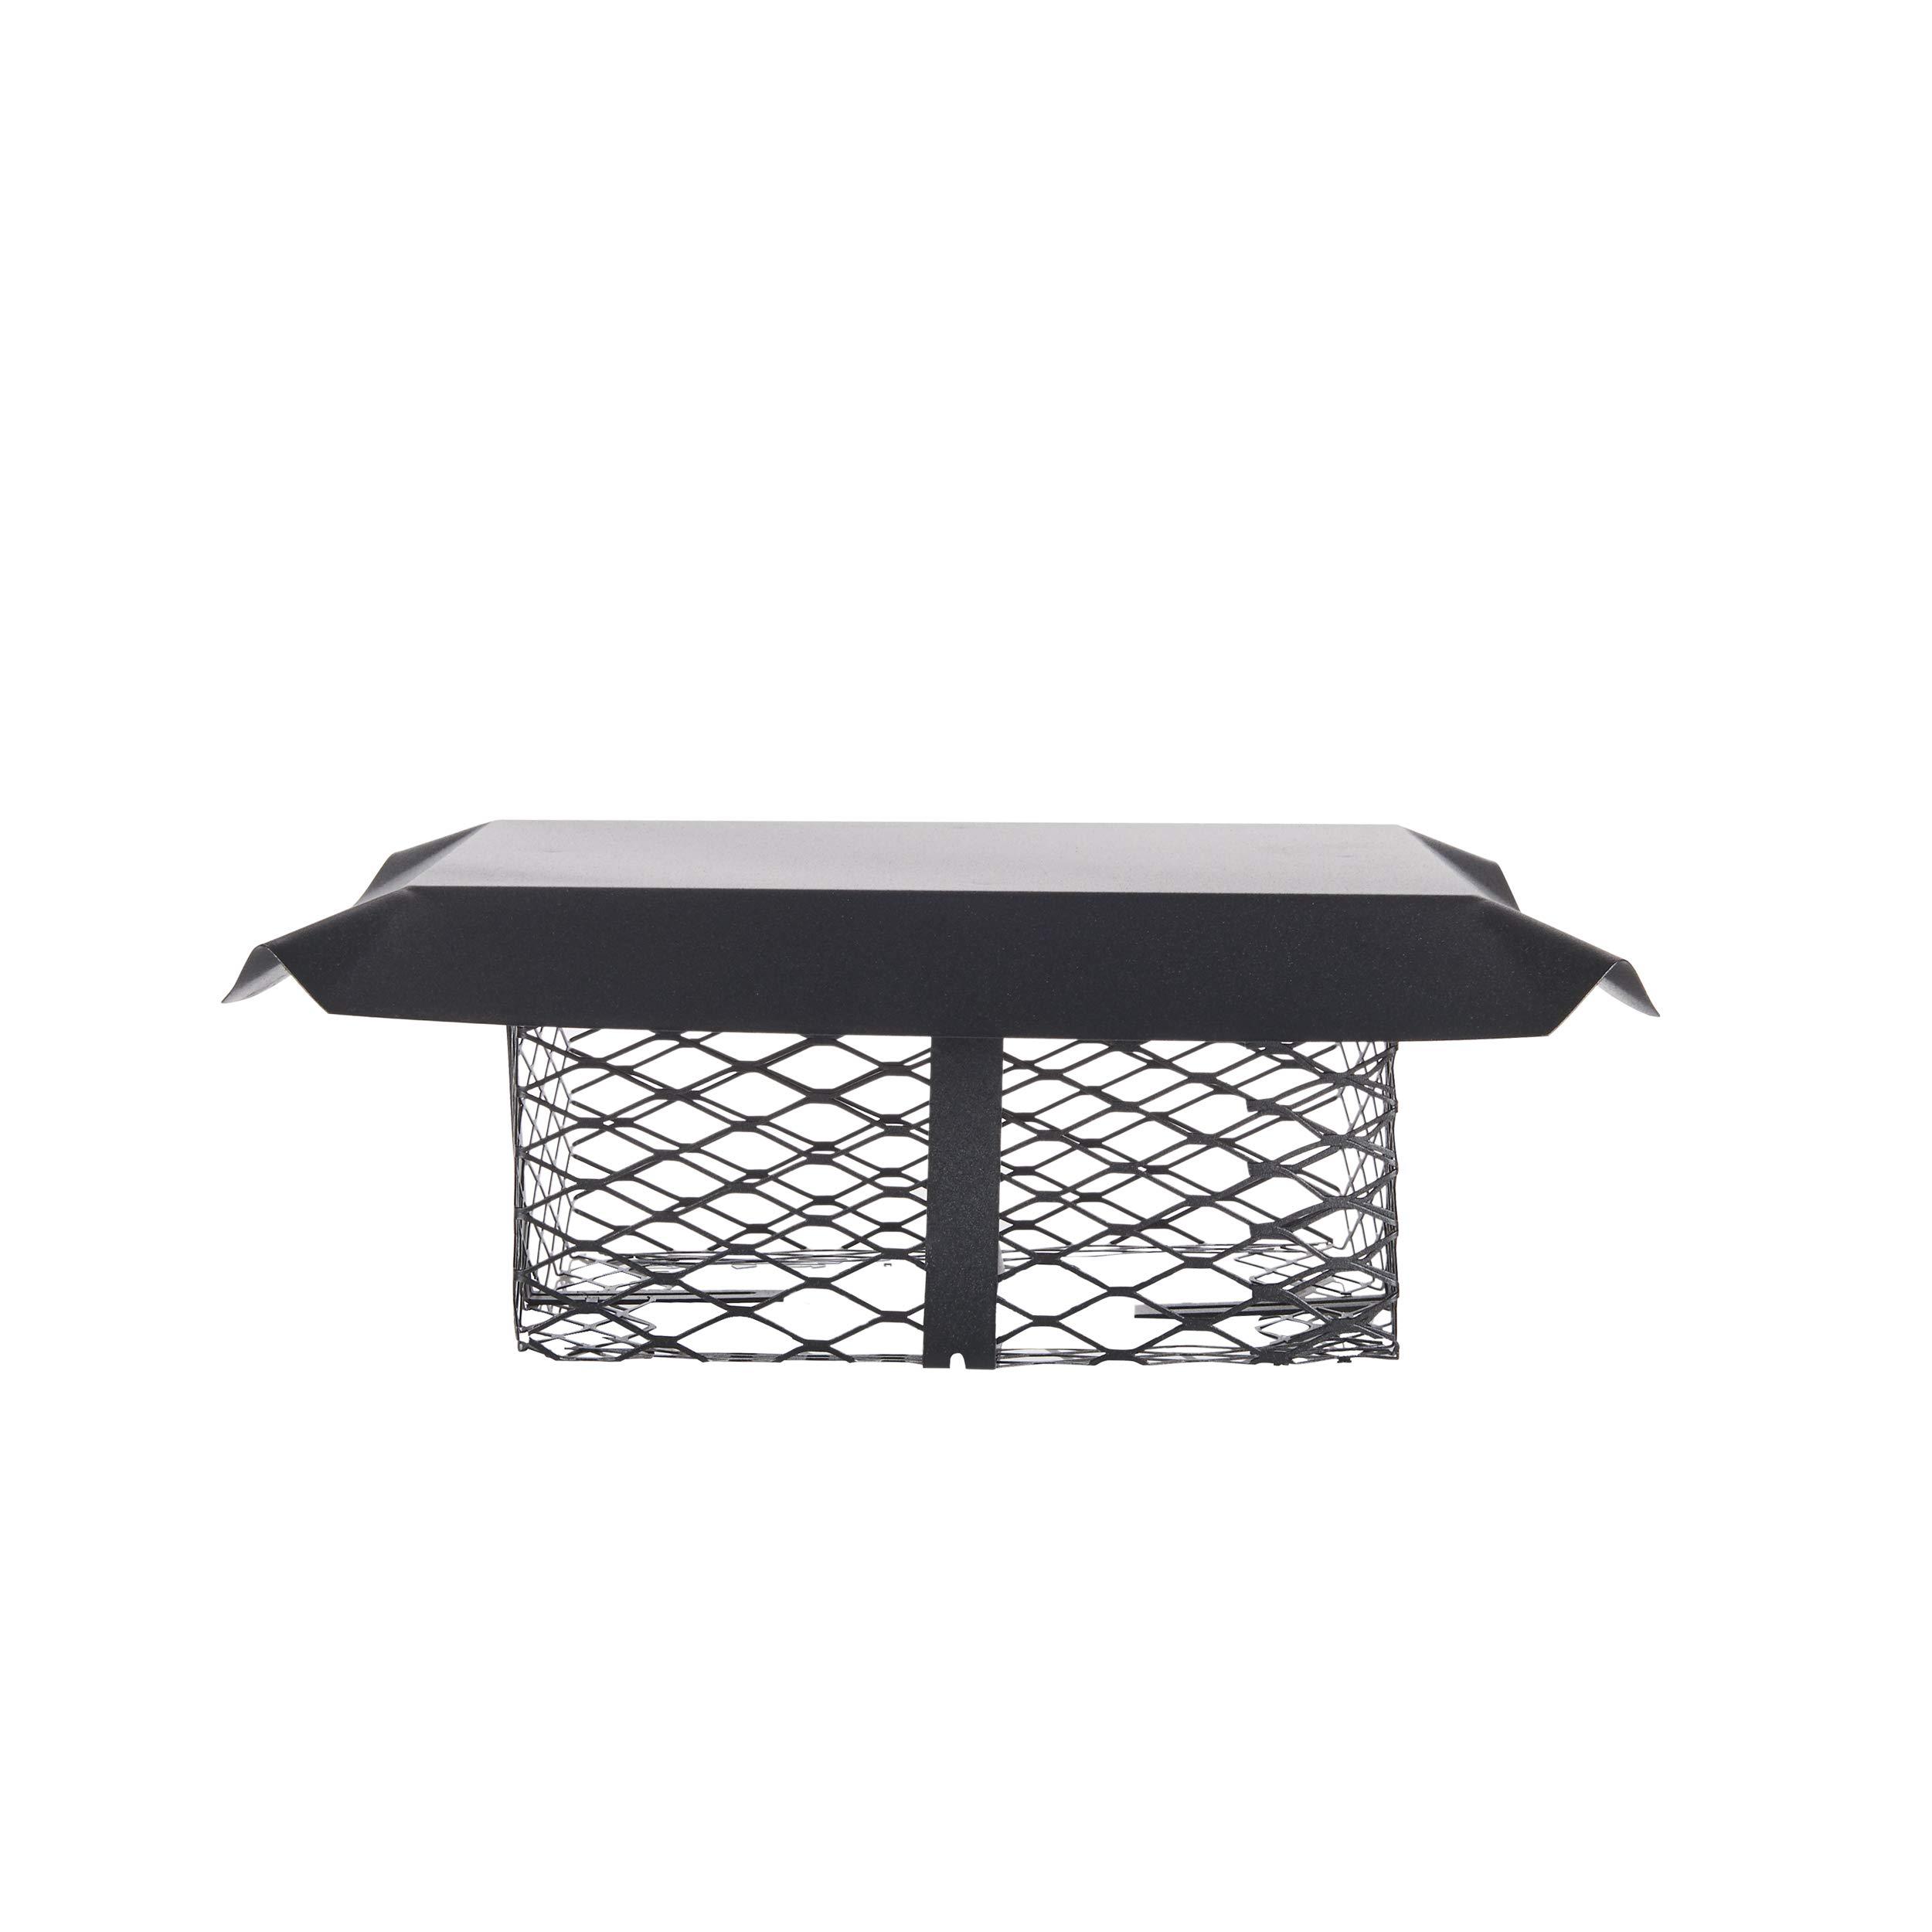 Shelter SCADJ-S Adjustable Clamp On Black Galvanized Steel Single Flue Chimney Cap by Shelter